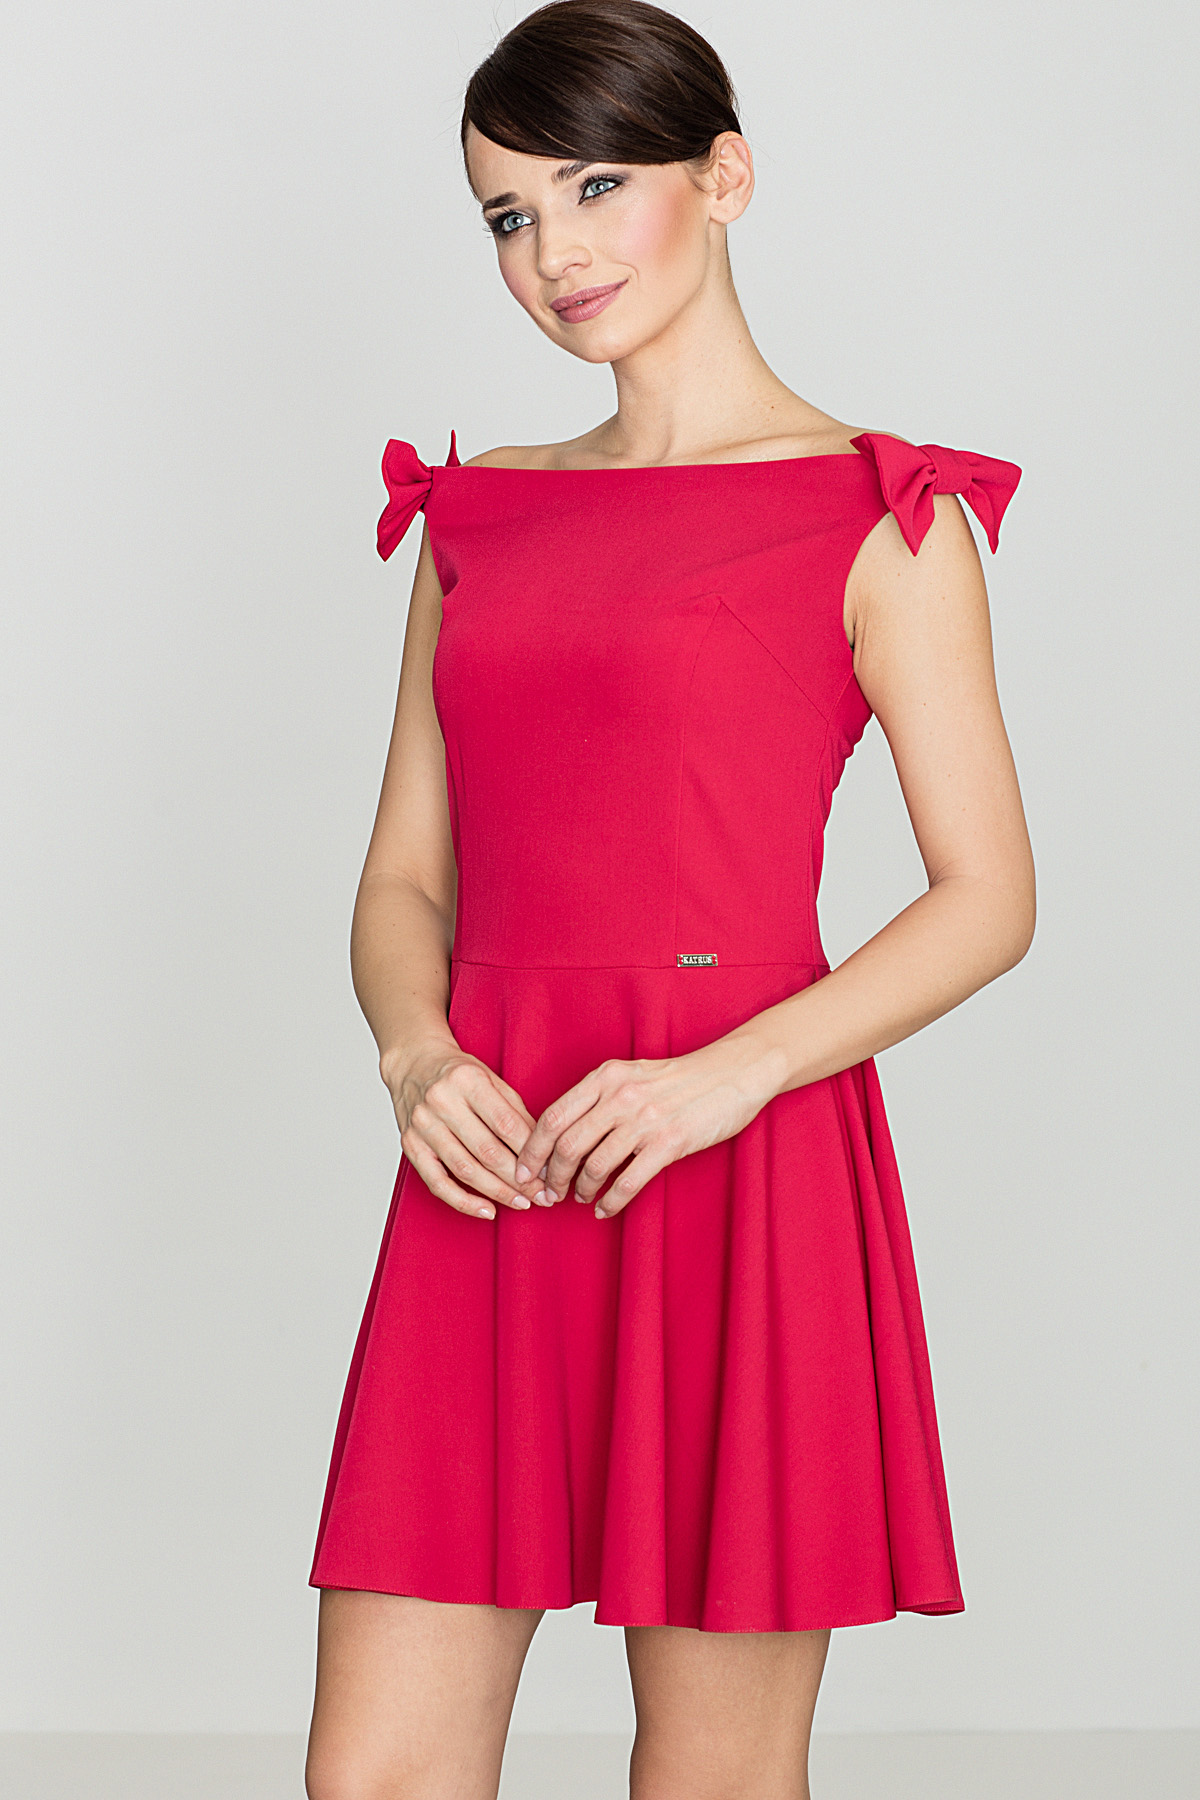 KATRUS Girly κλος φορεμα